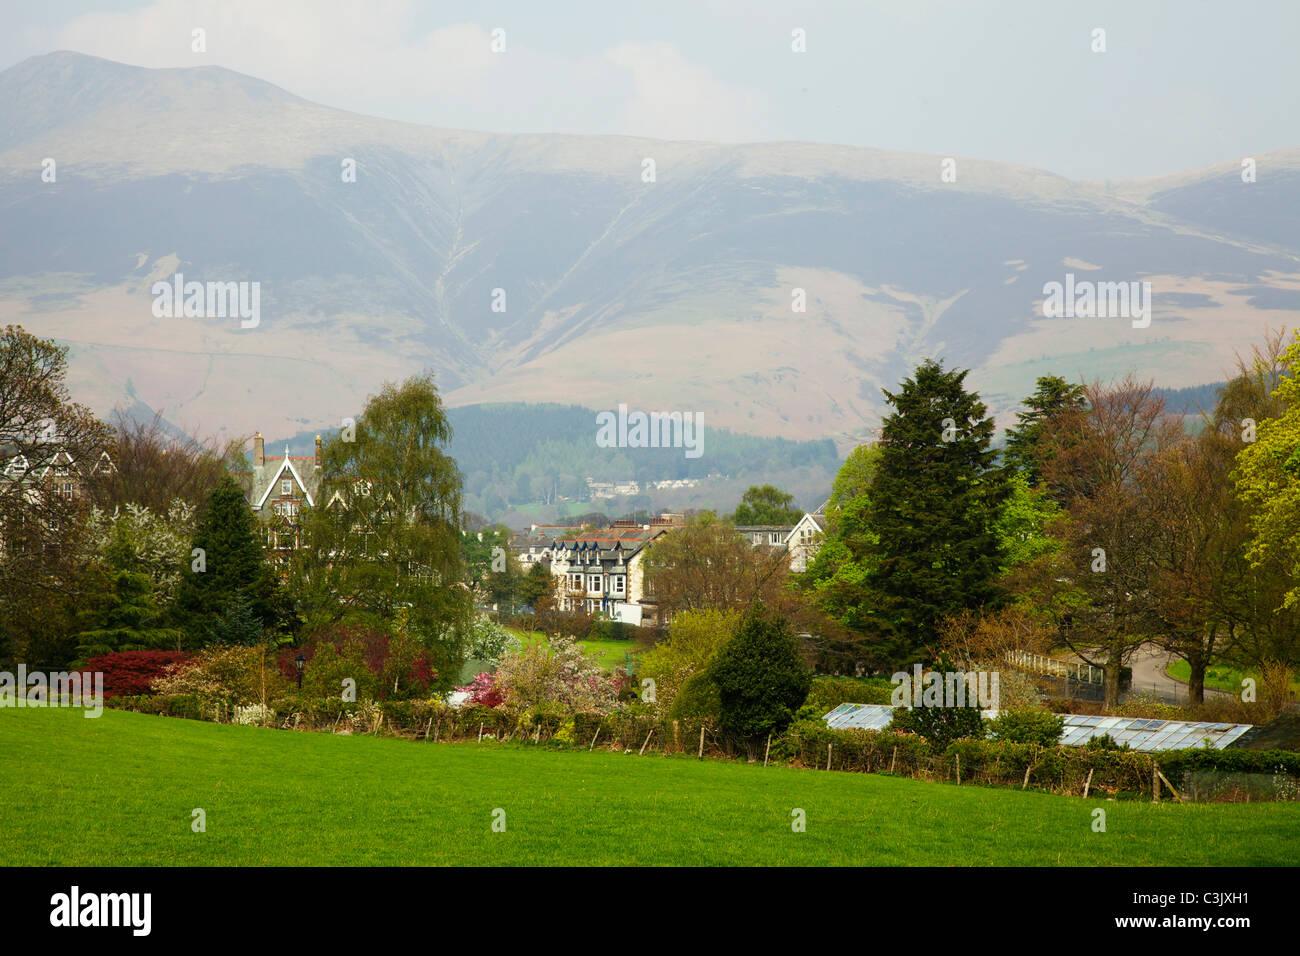 Keswick town and hills, Lake District - Stock Image